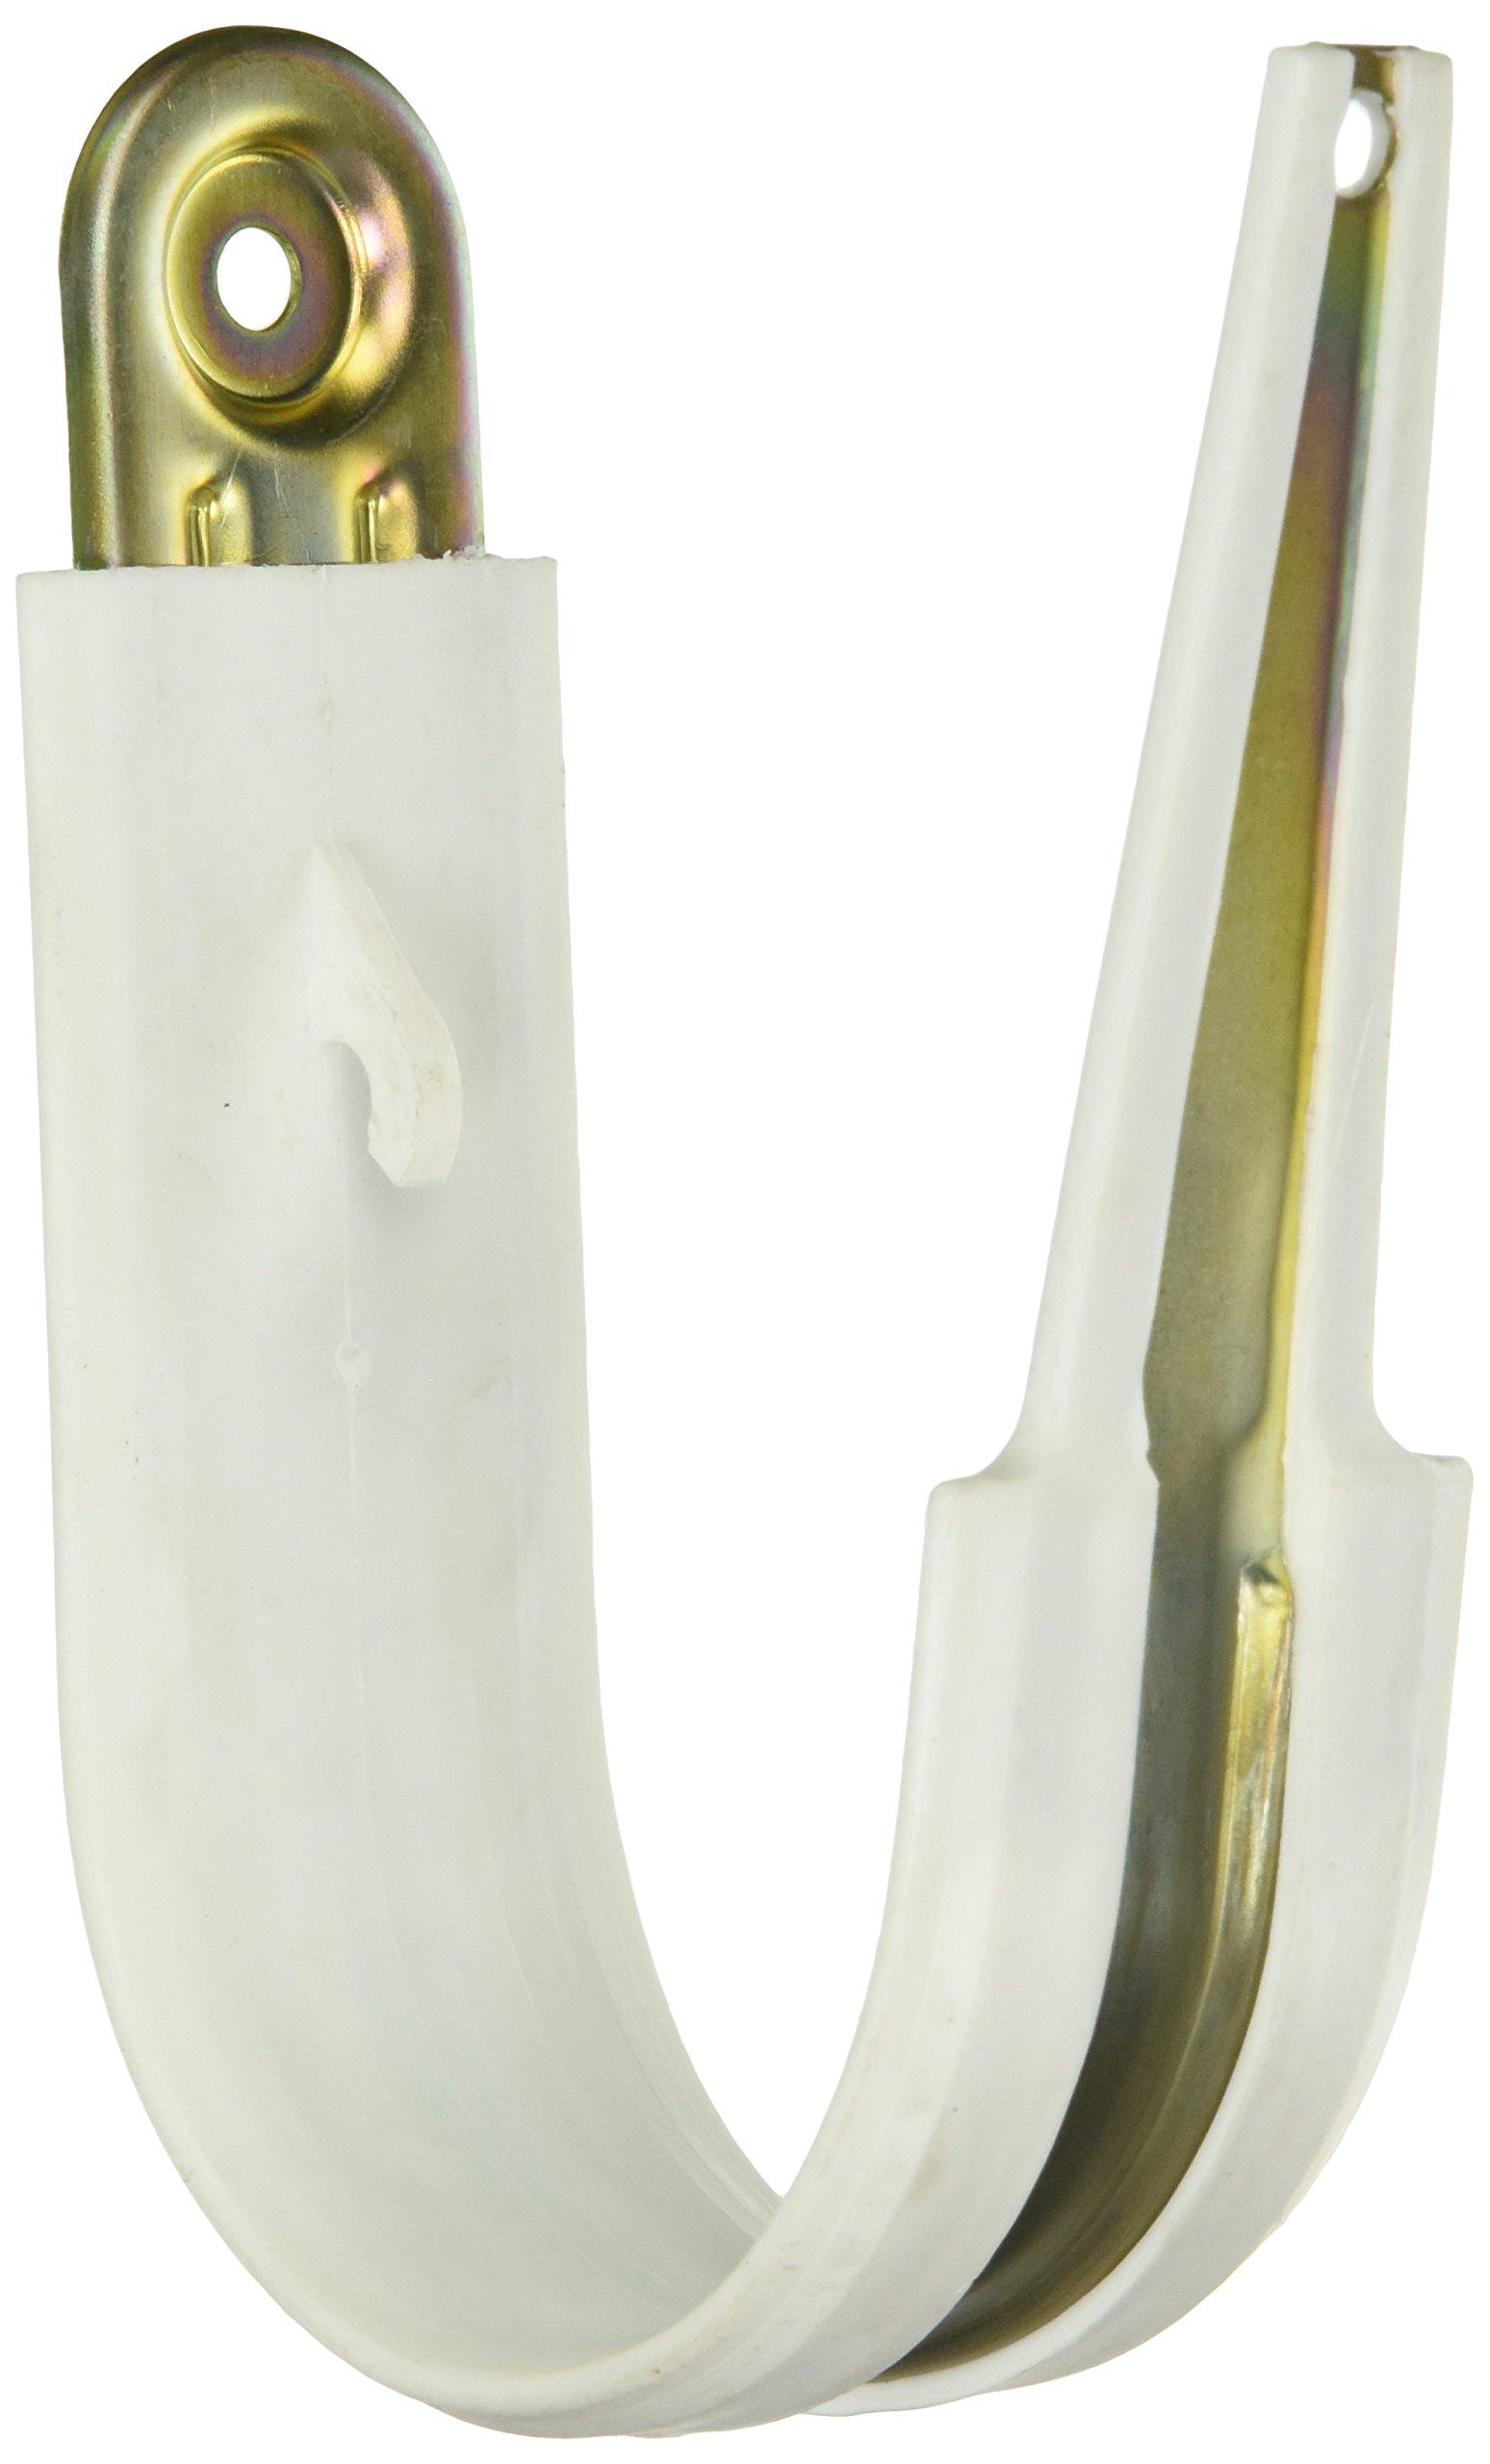 Platinum Tools CCP48-25 3-Inch Standard Ccp J-Hook, Size 48, 25 Per Box by Platinum Tools (Image #1)